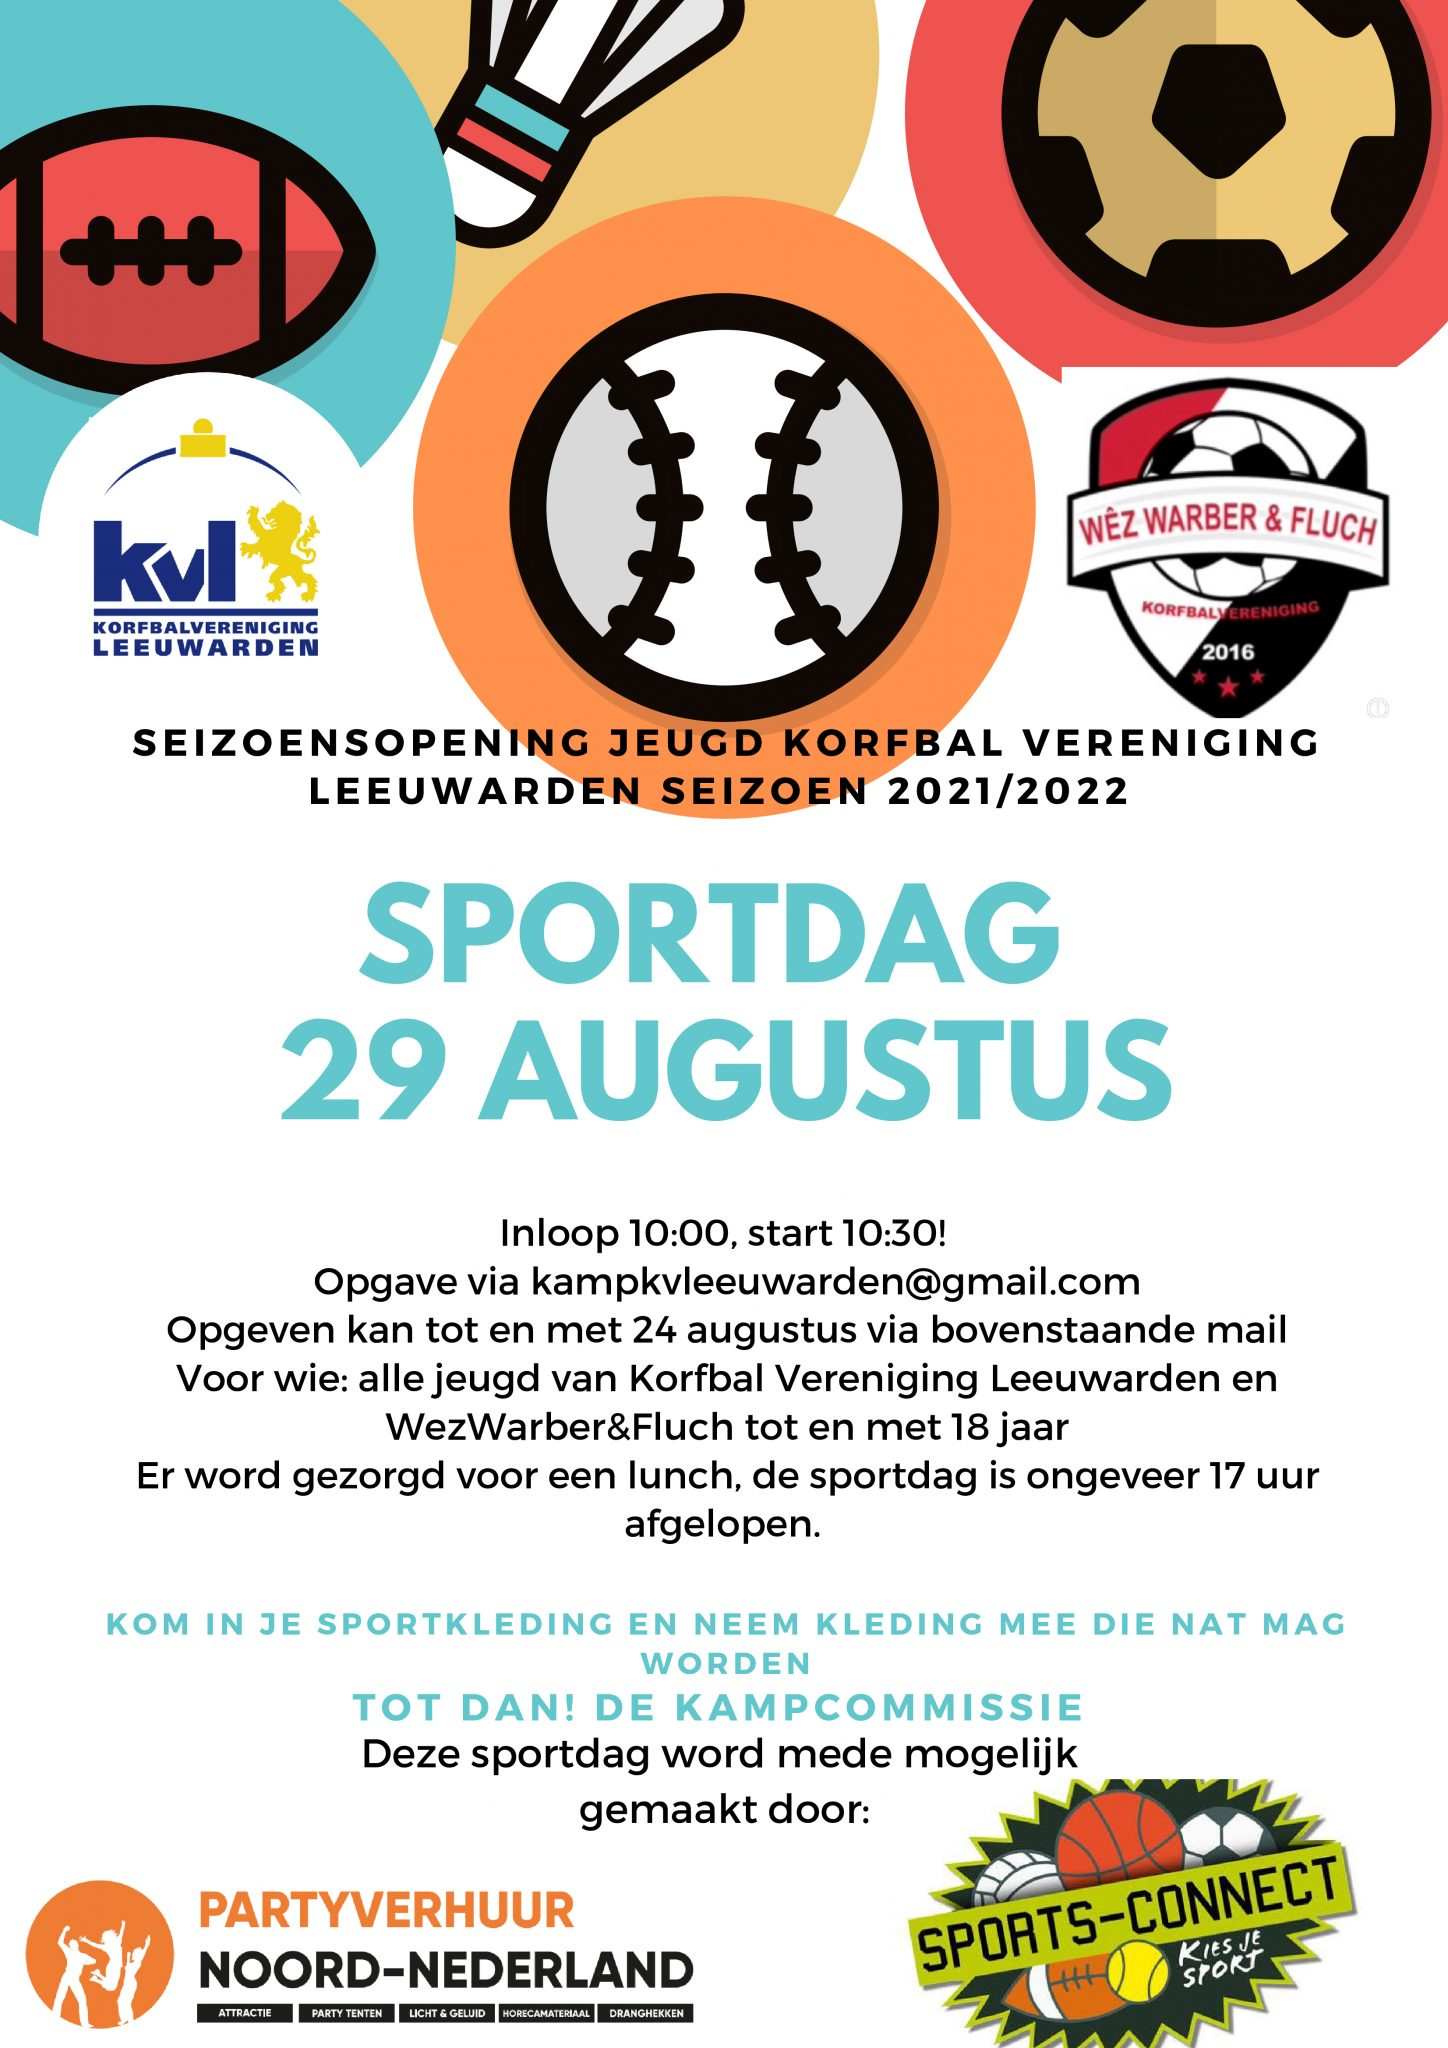 Seizoenopening jeugd: Sportdag 29 augustus